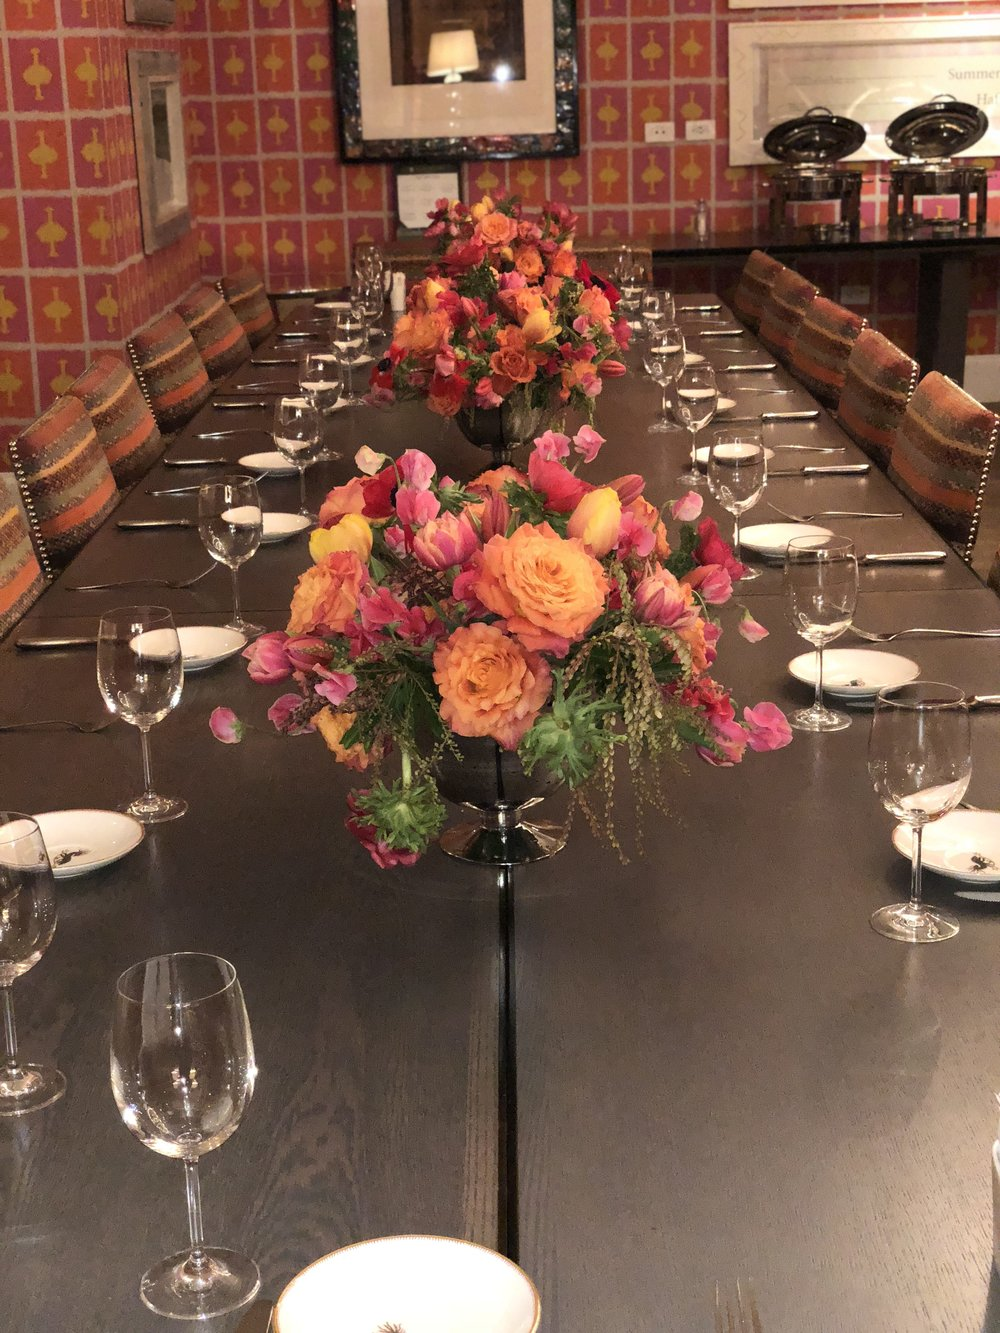 Sugarfina Brunch Table Runner- B Floral